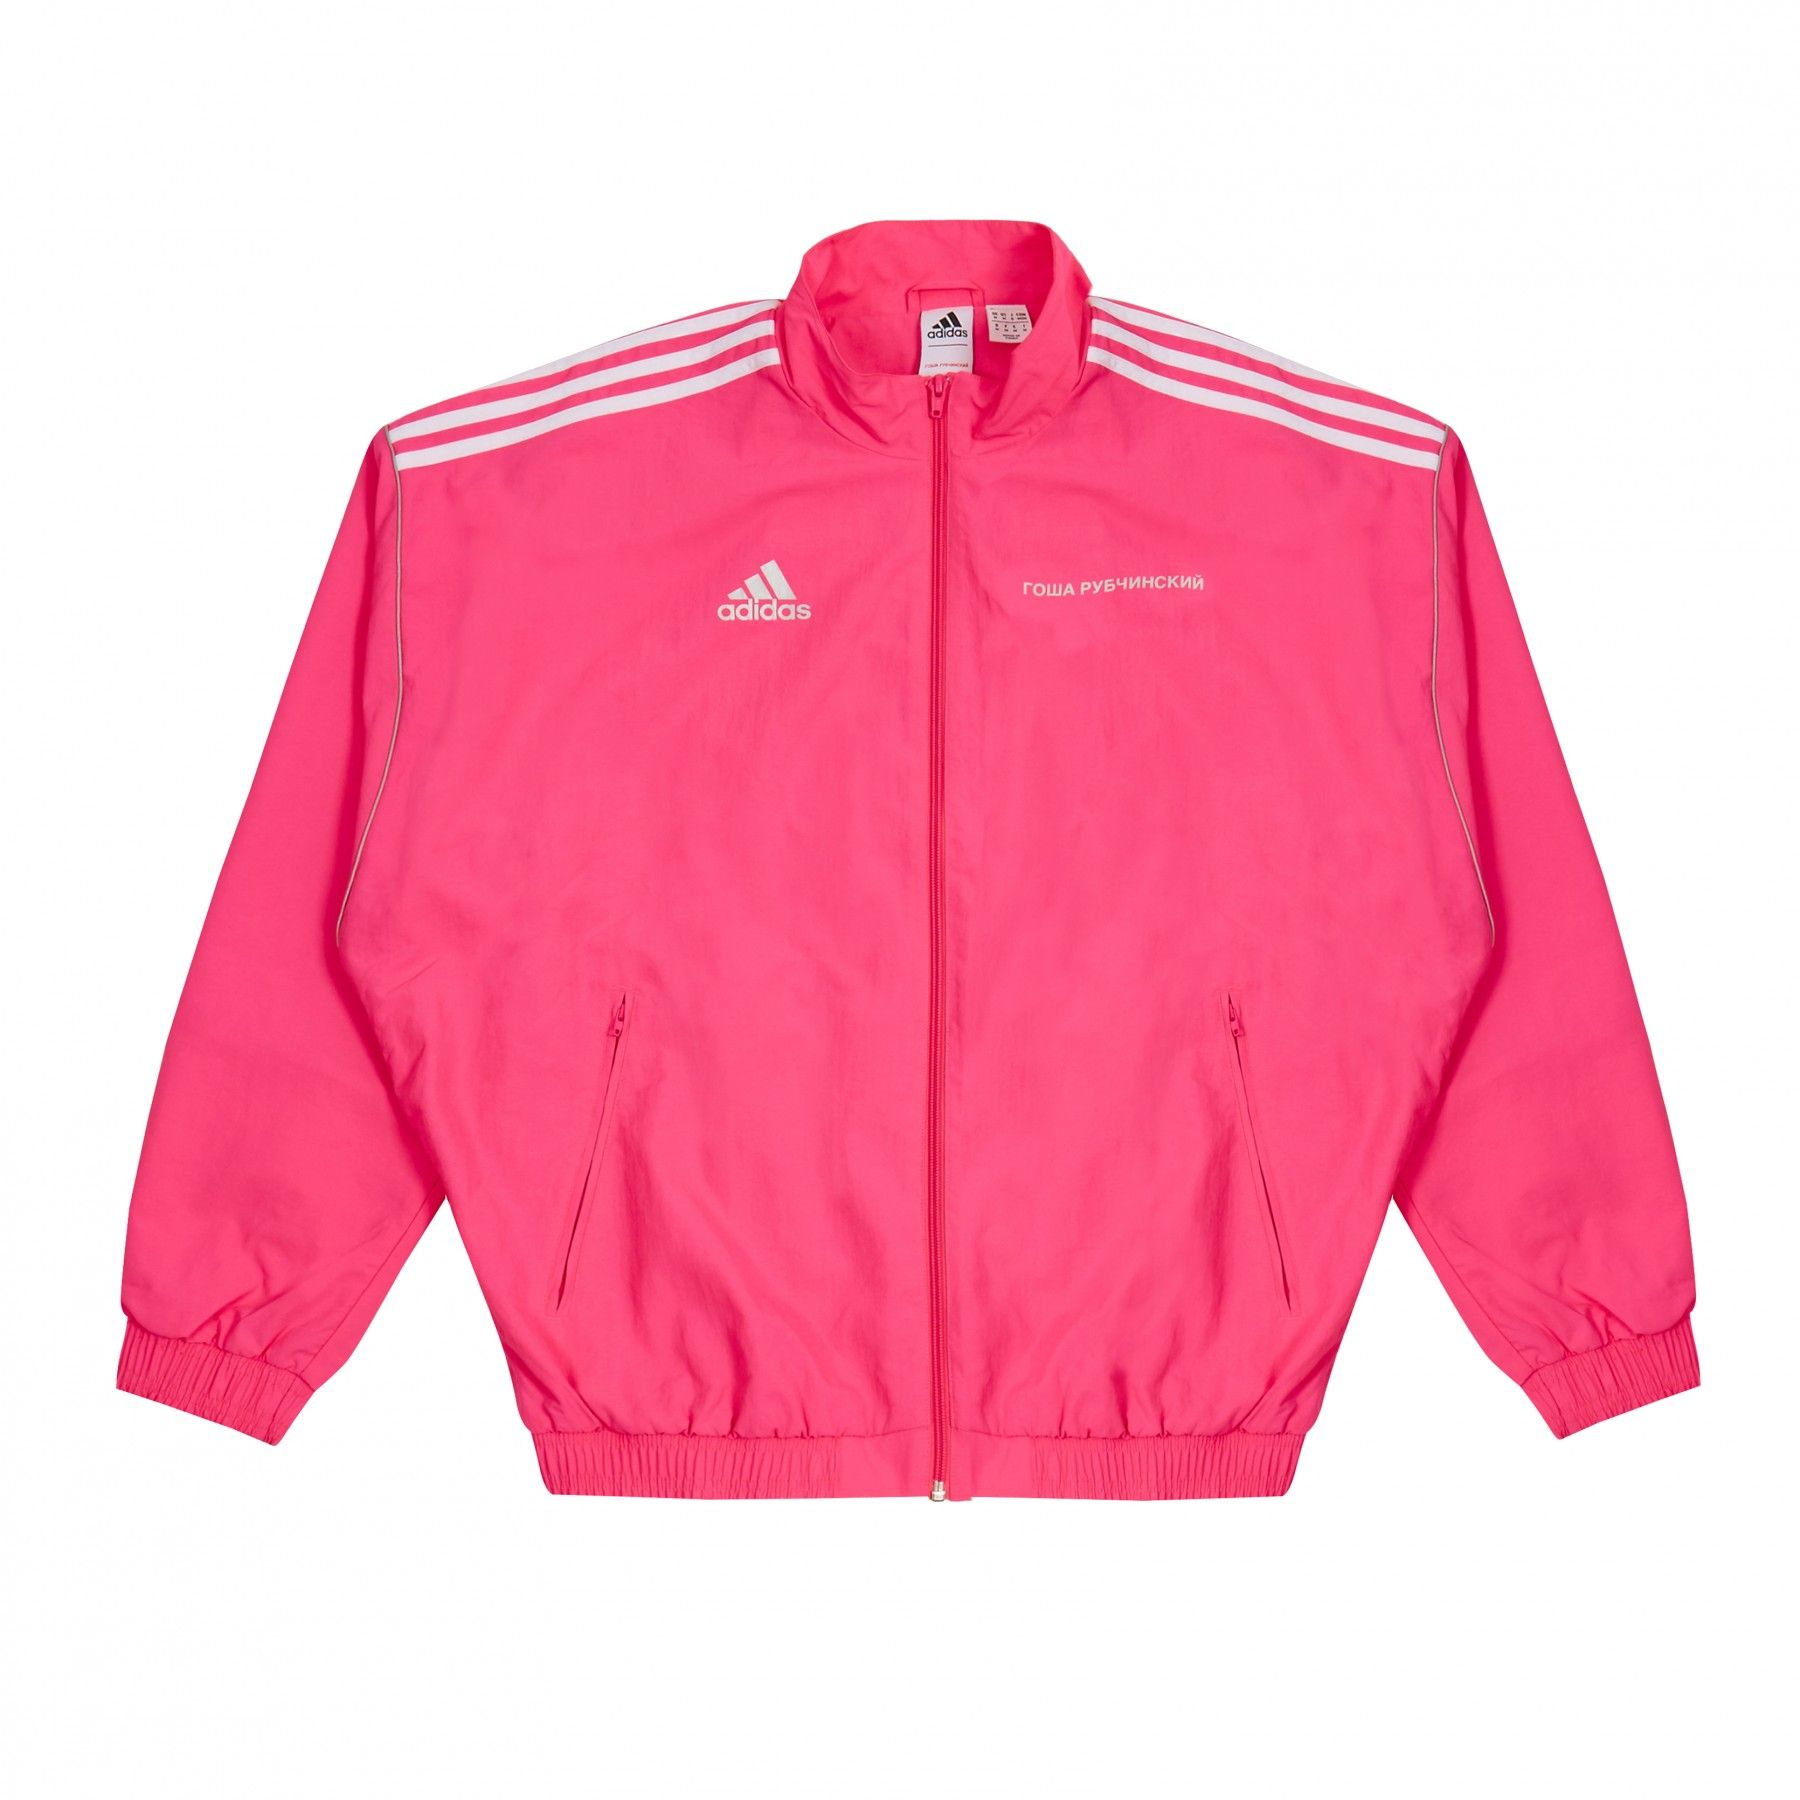 Gosha Rubchinskiy x Adidas Track Top (Pink) | Adidas, Adidas